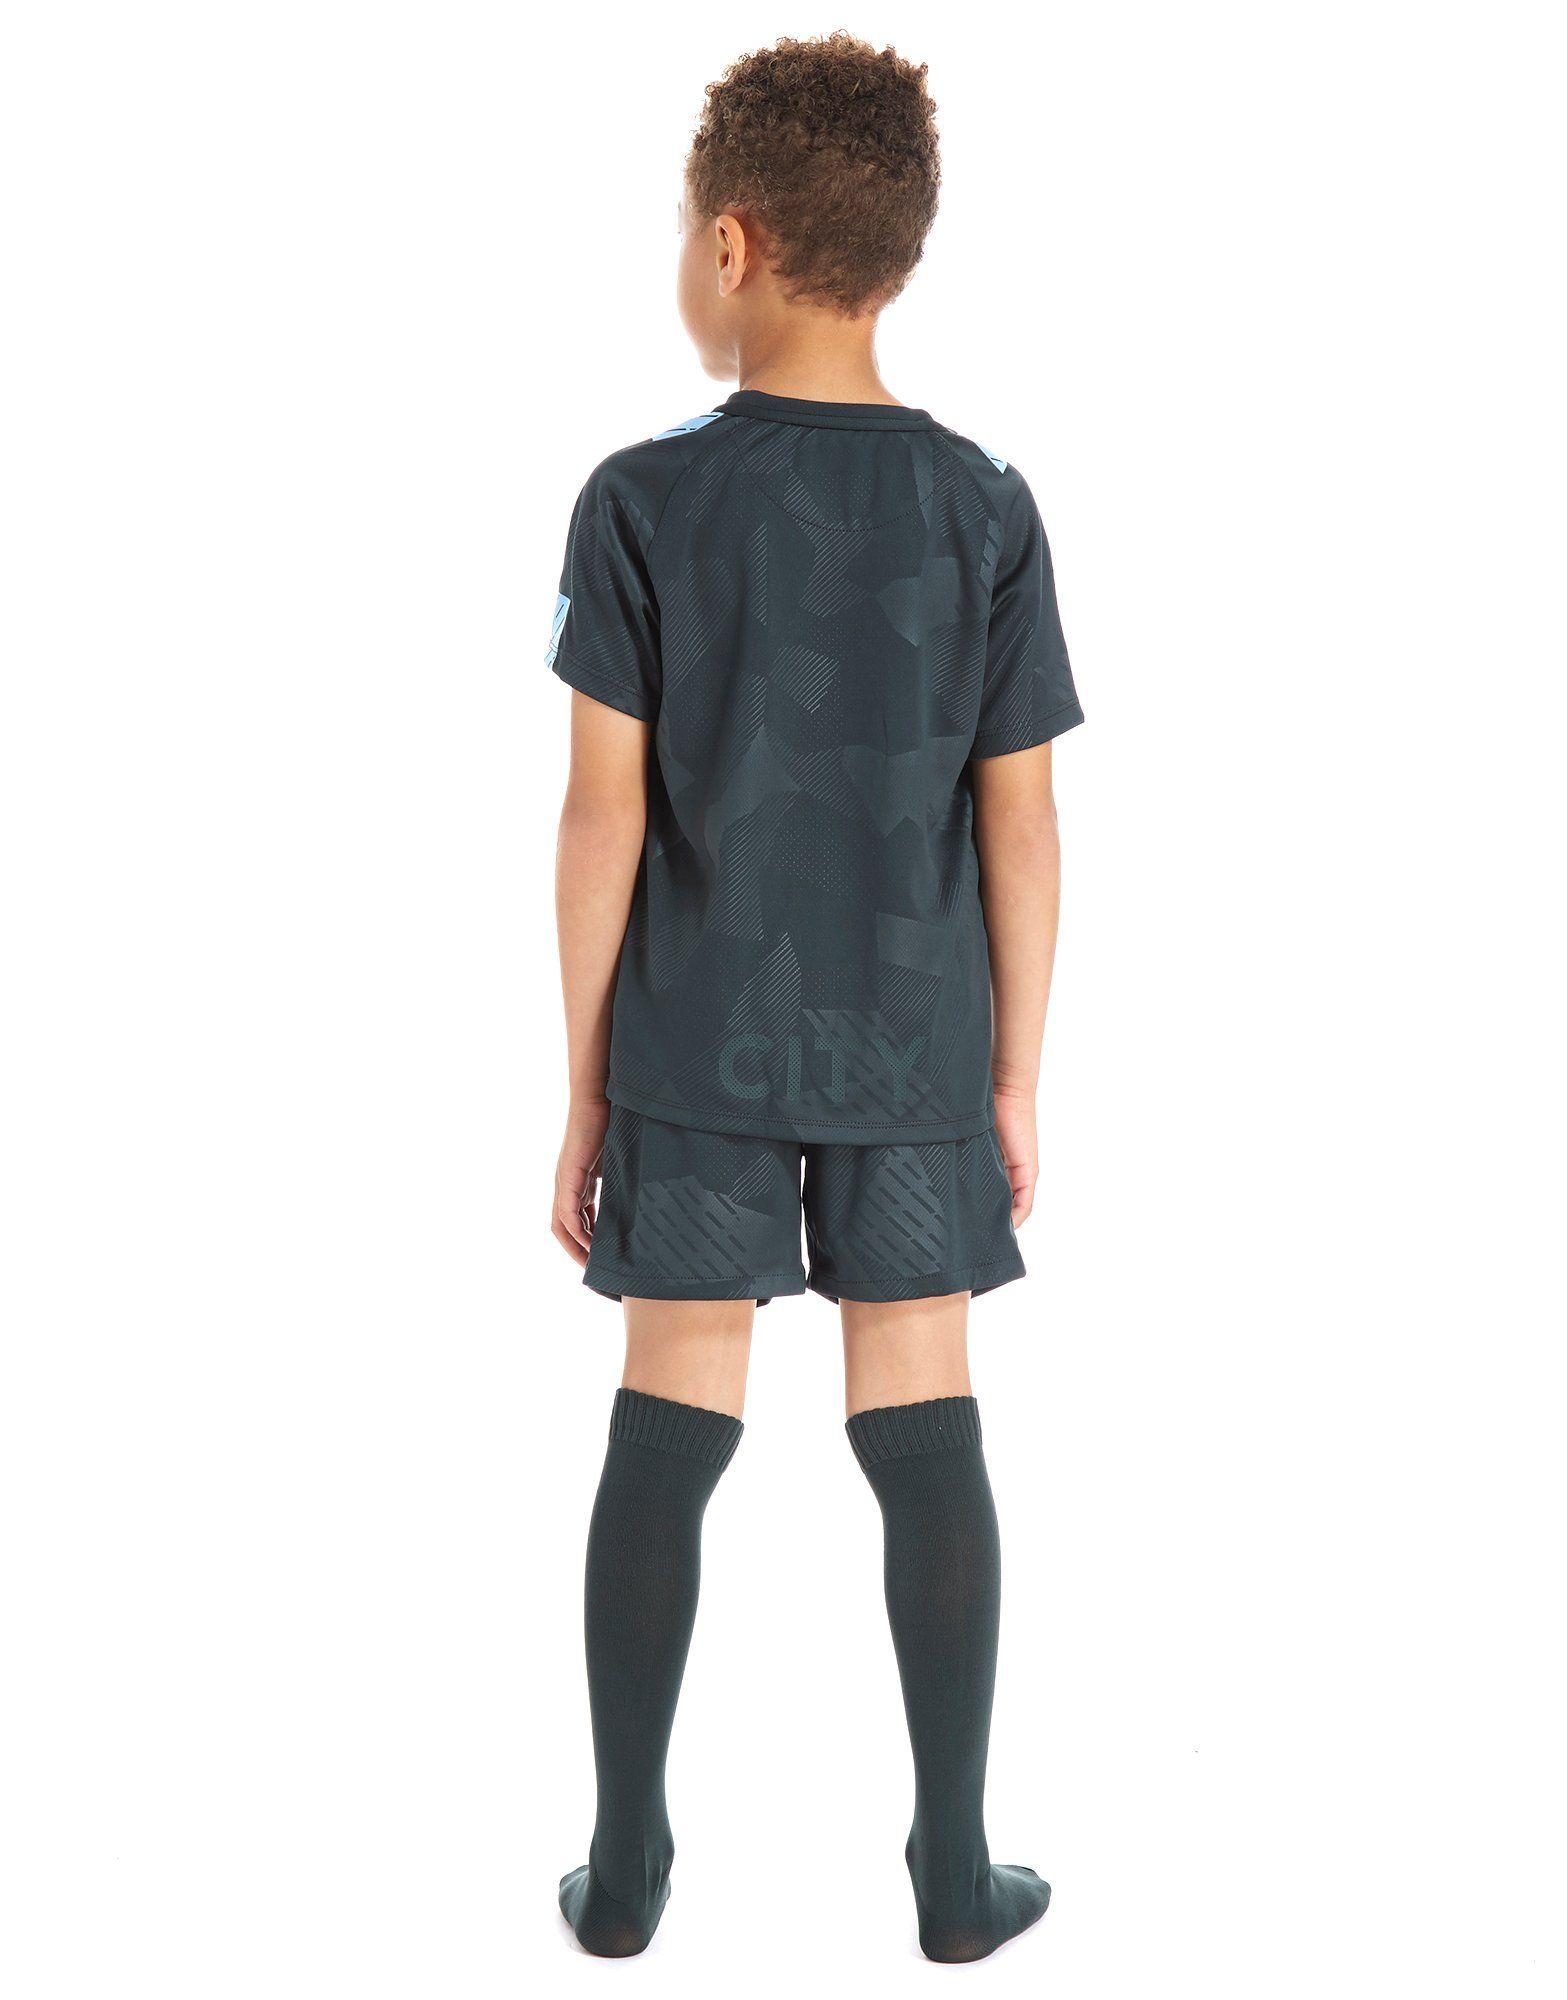 Nike Manchester City FC 2017/18 Third Kit Children